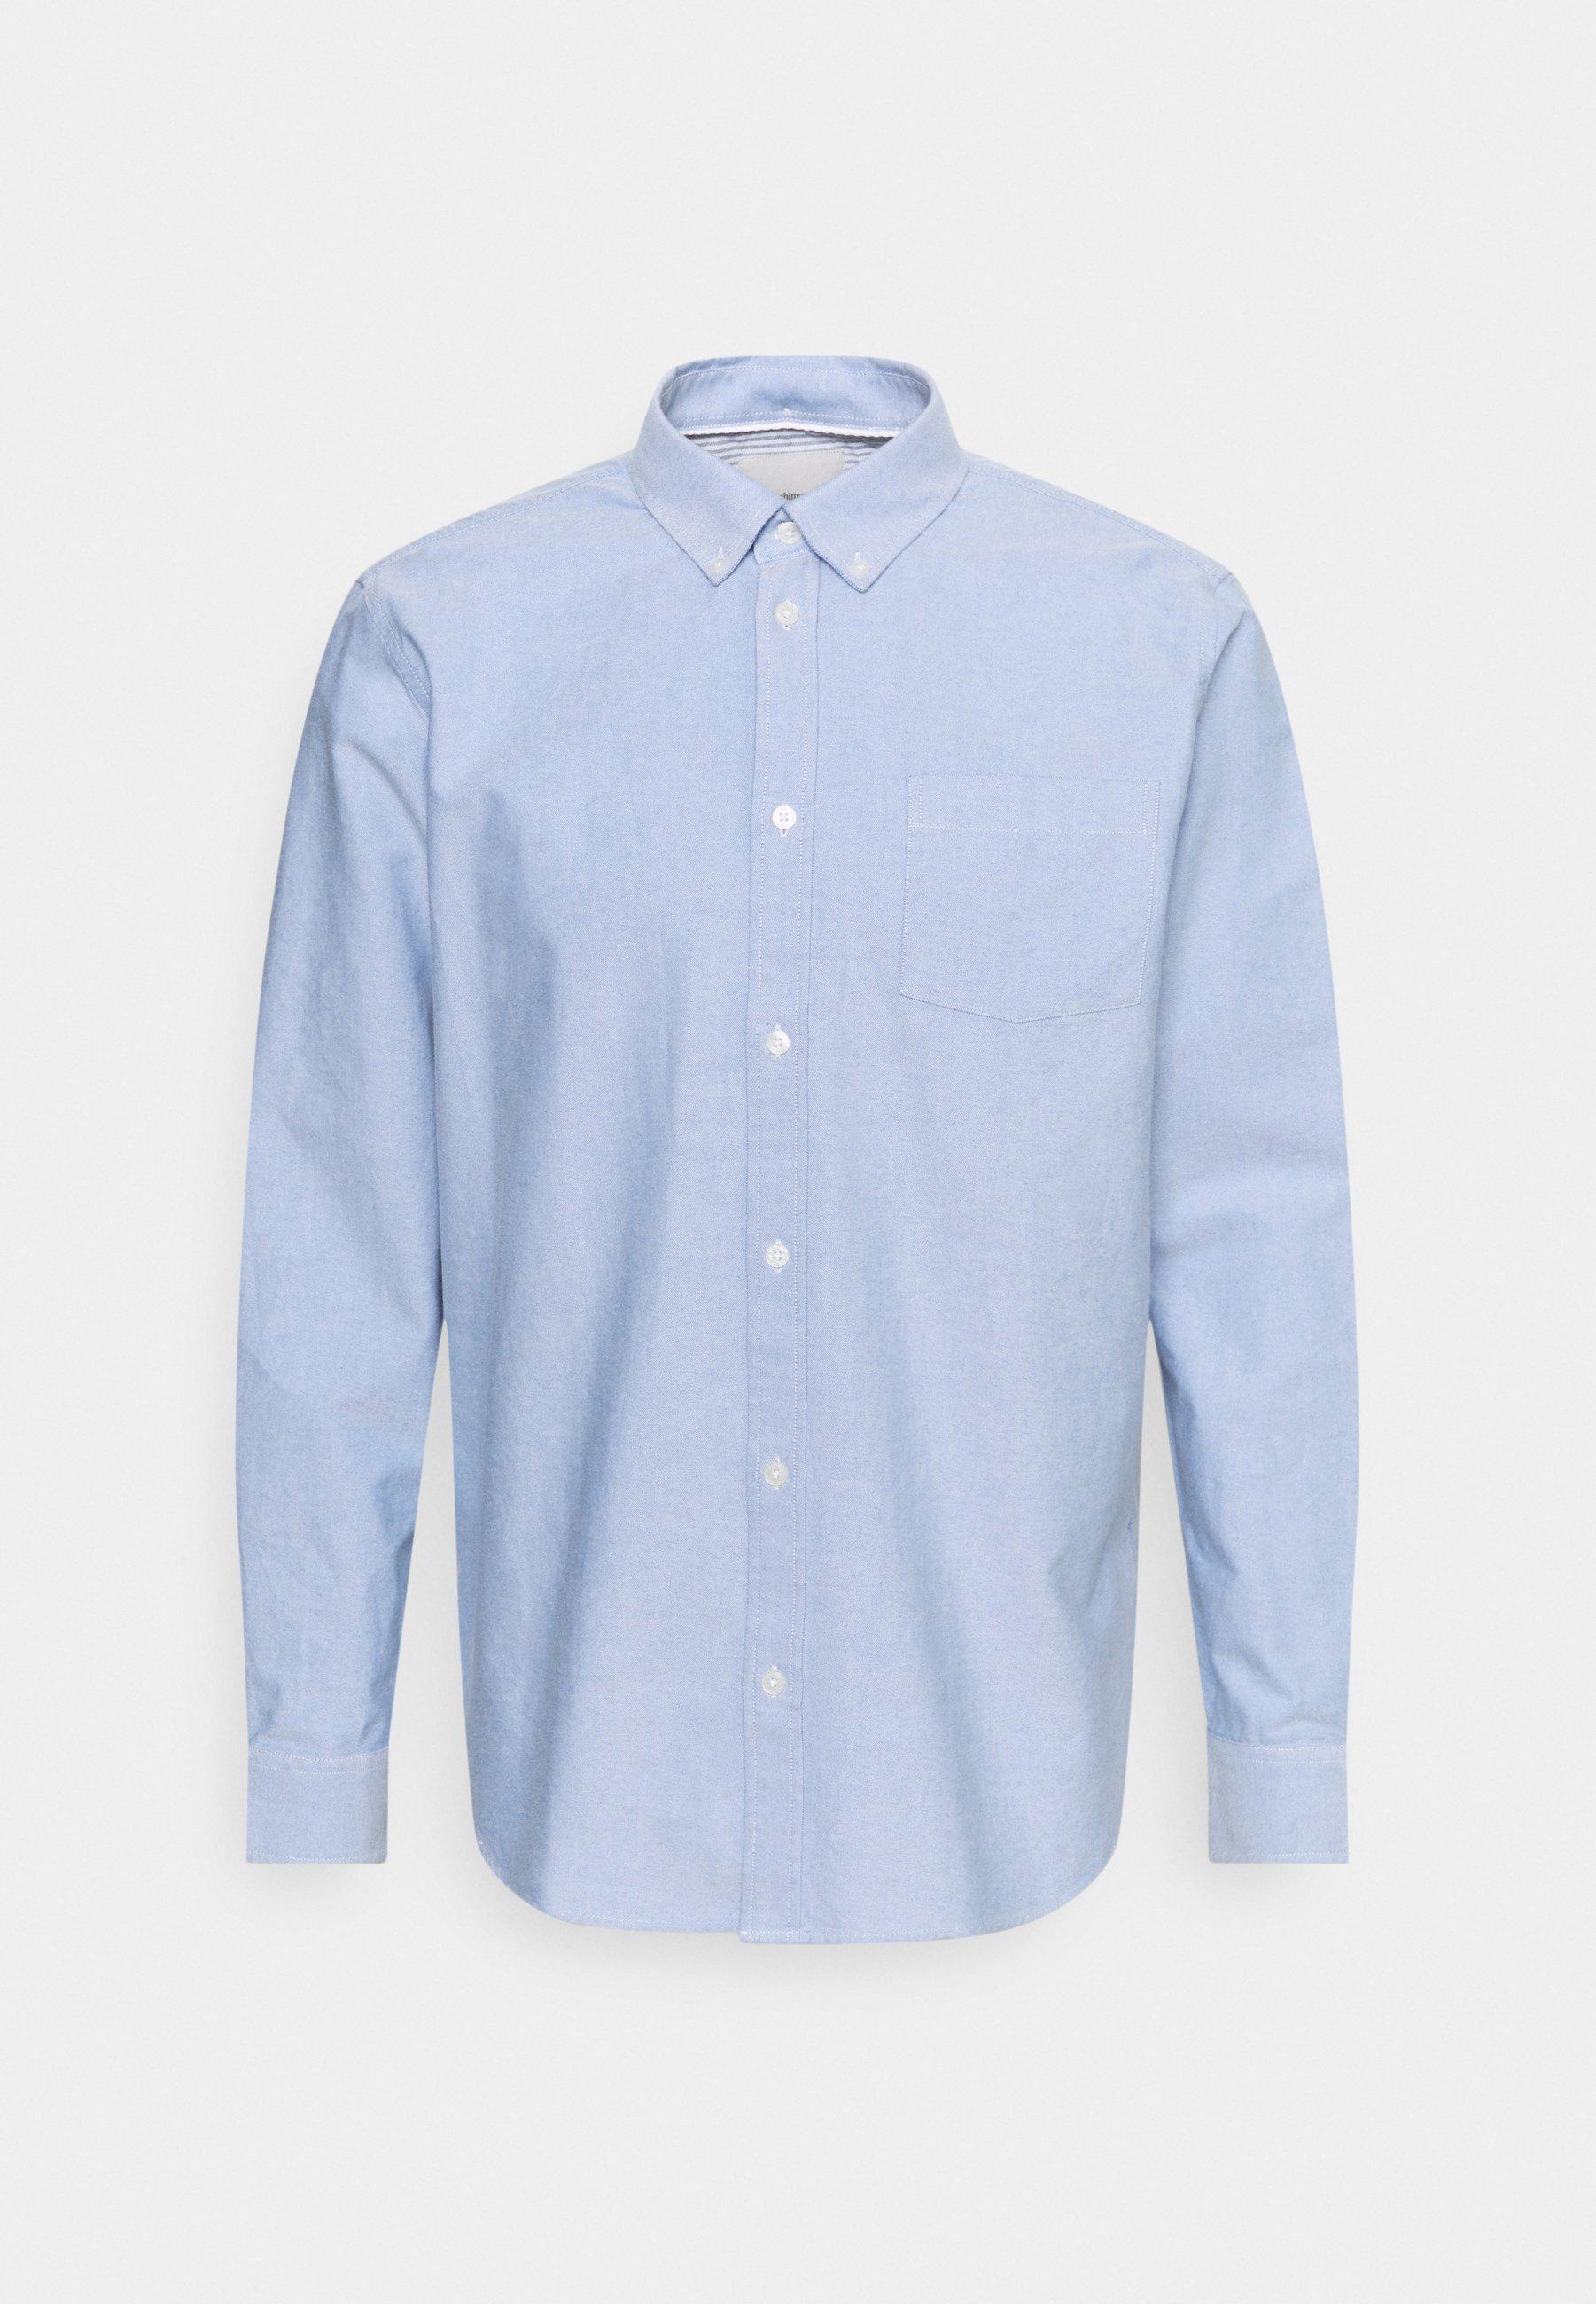 Uomo CHARMING - Camicia